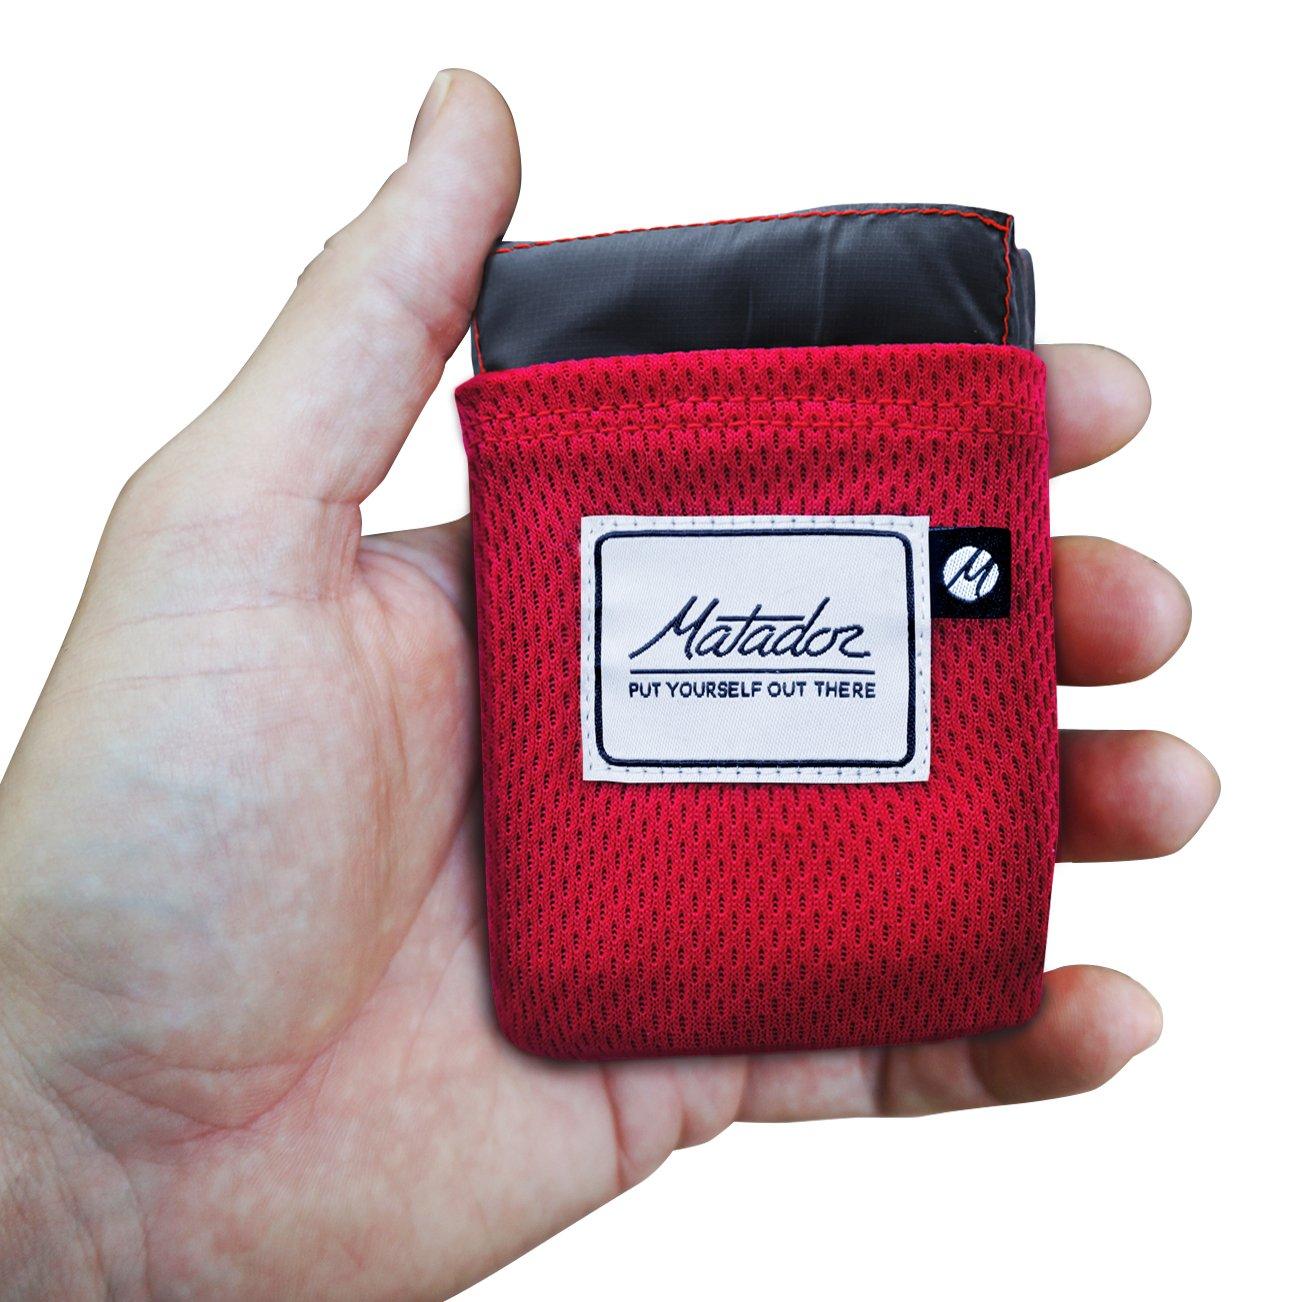 Matador Blanket Camping Resistant Original